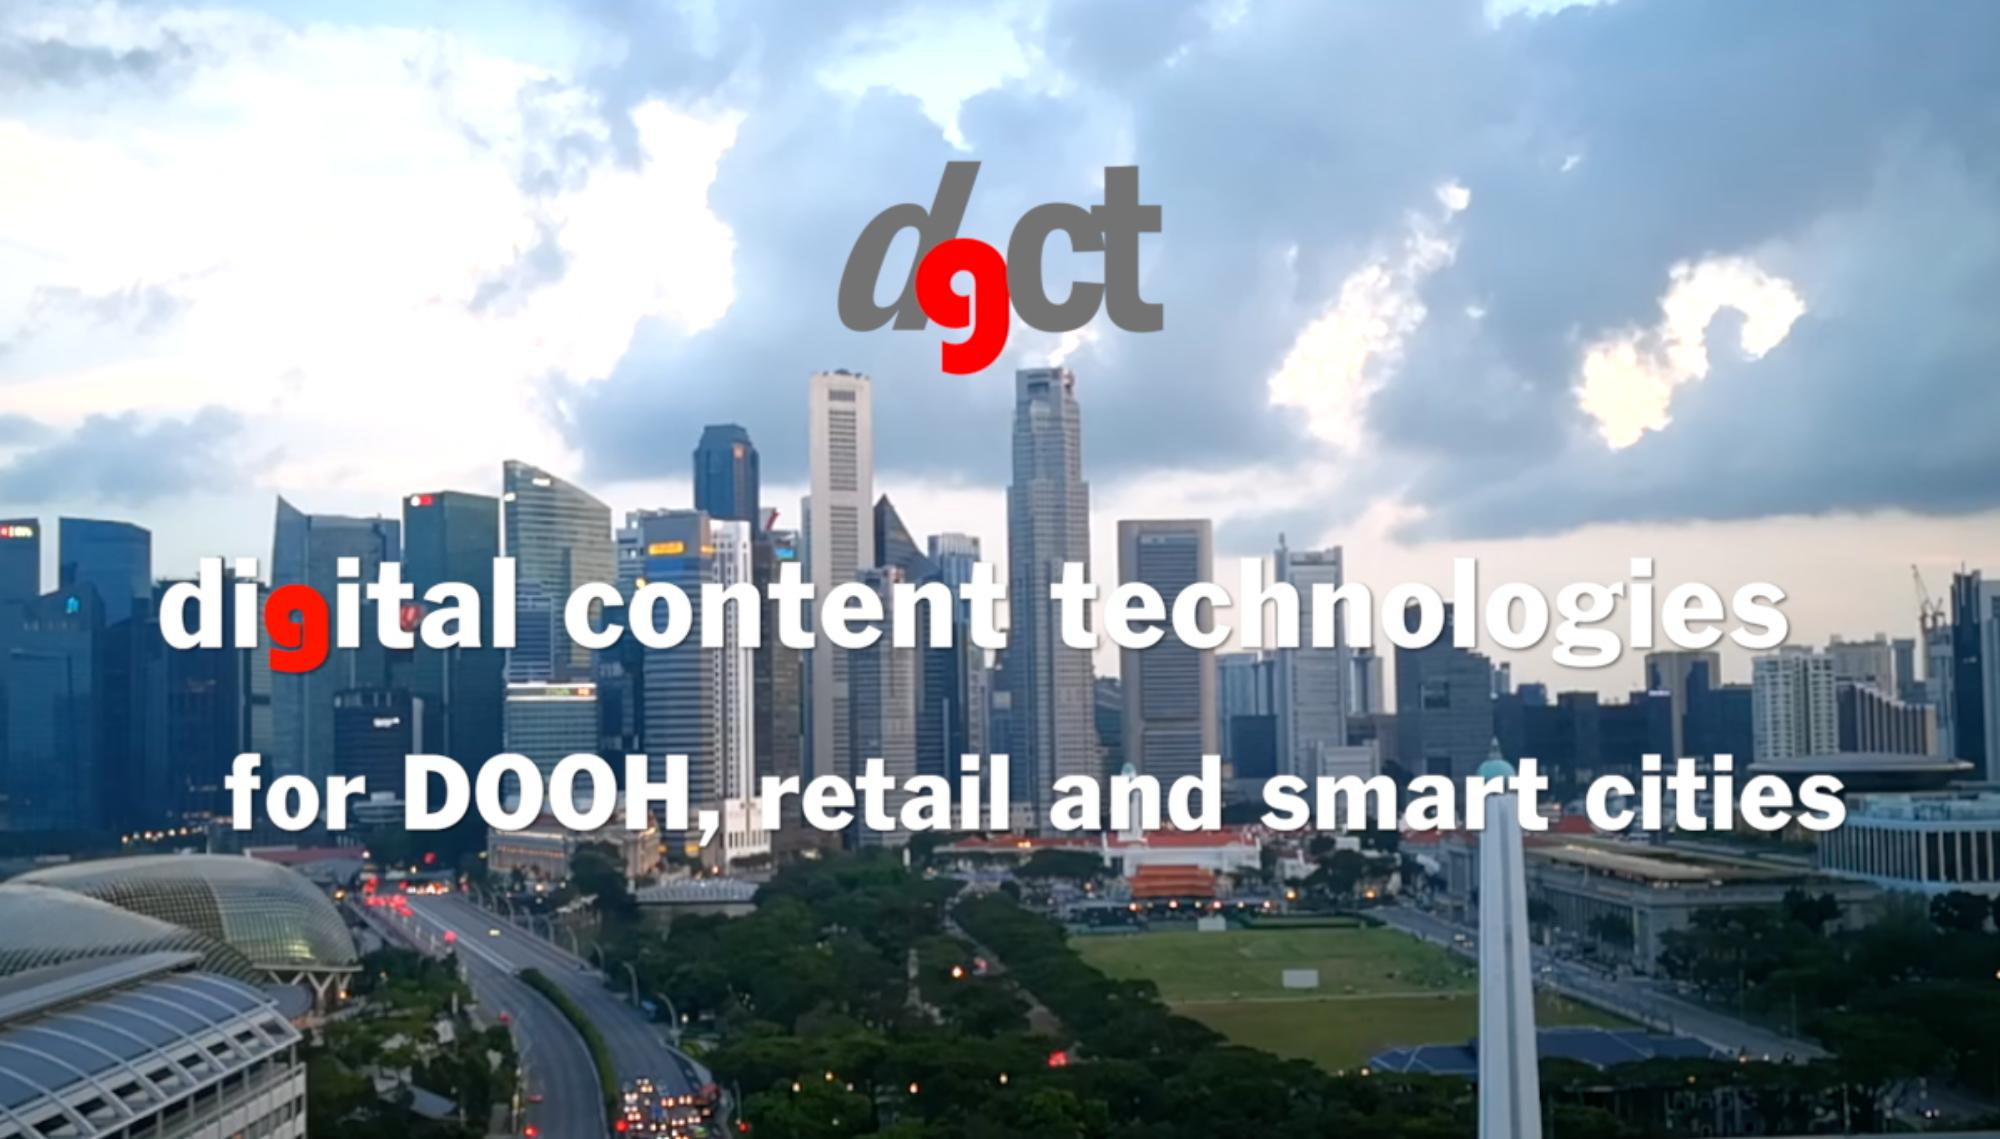 DGCT - Digital Content Technologies - www.dgct.com